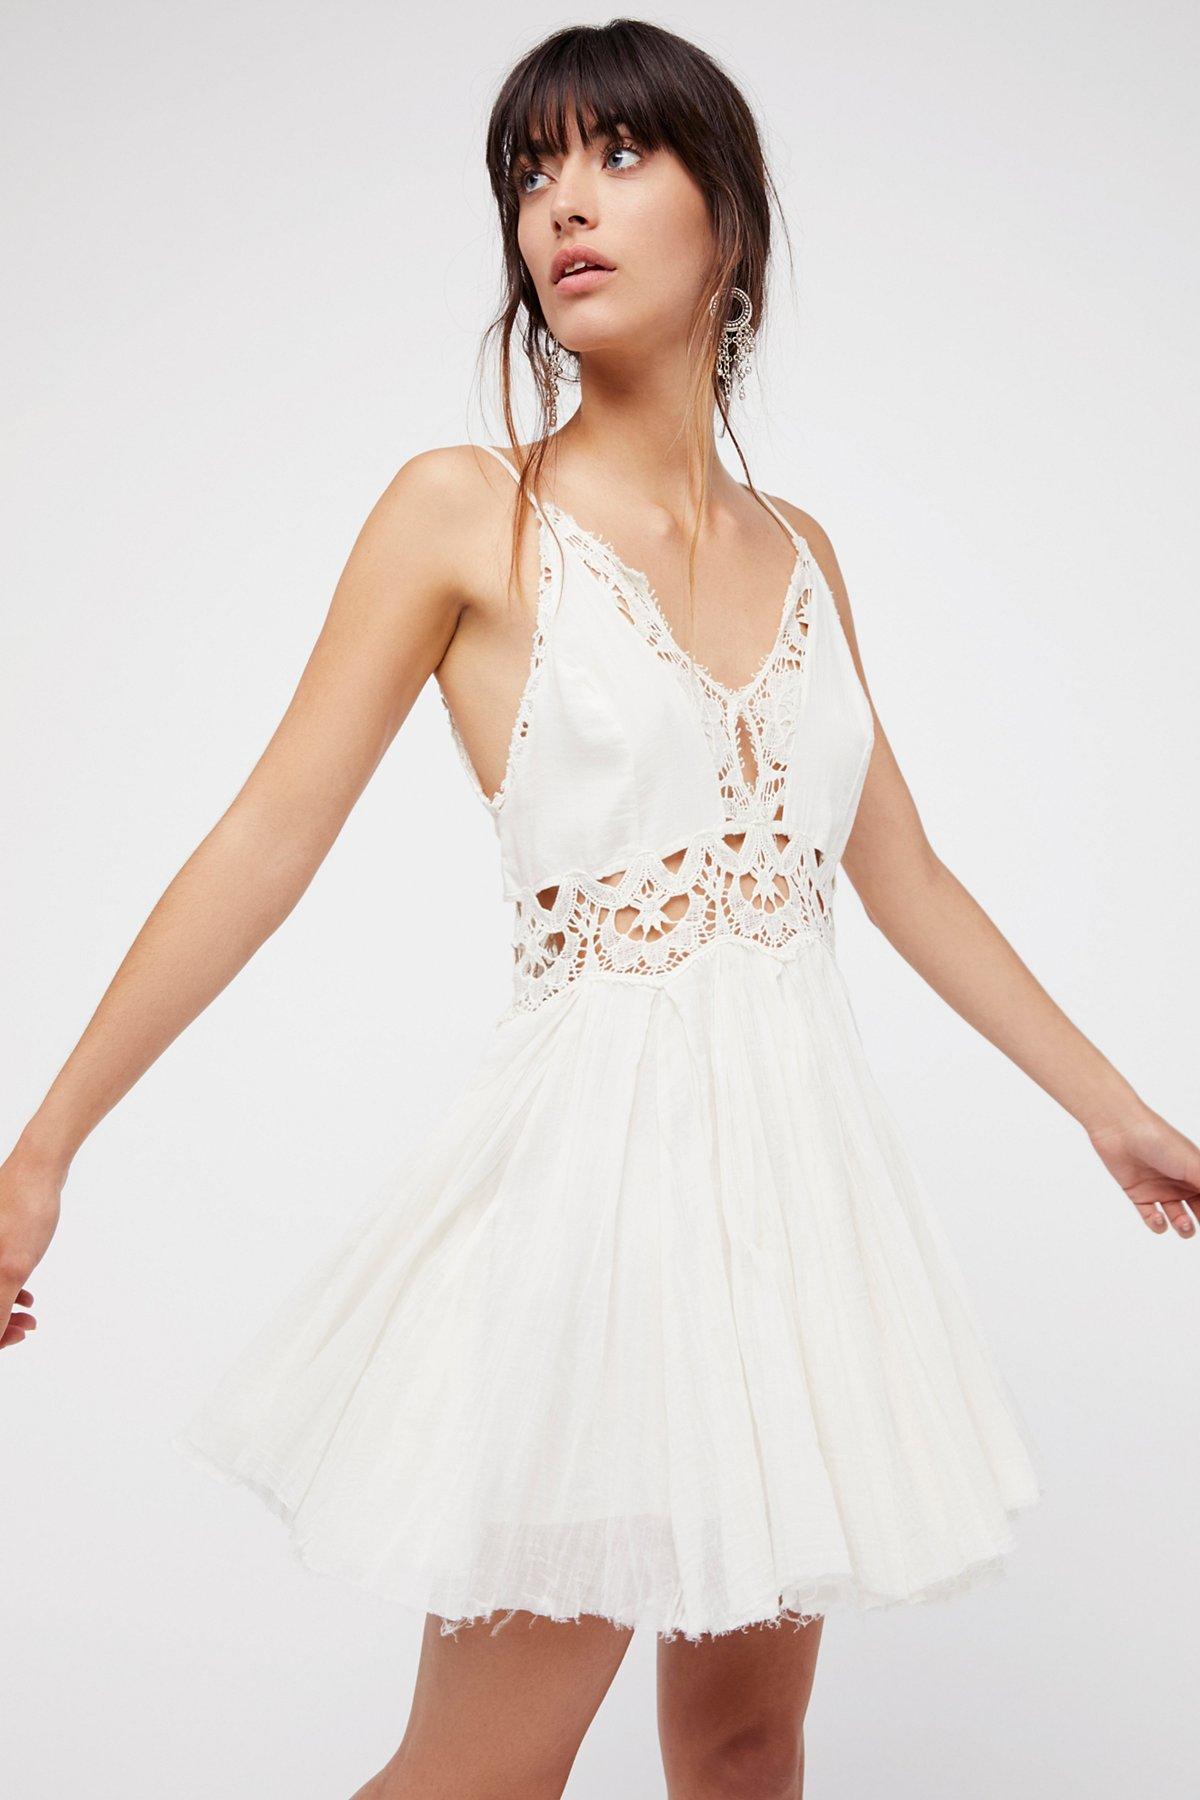 FP One Coast to Cove Mini Dress